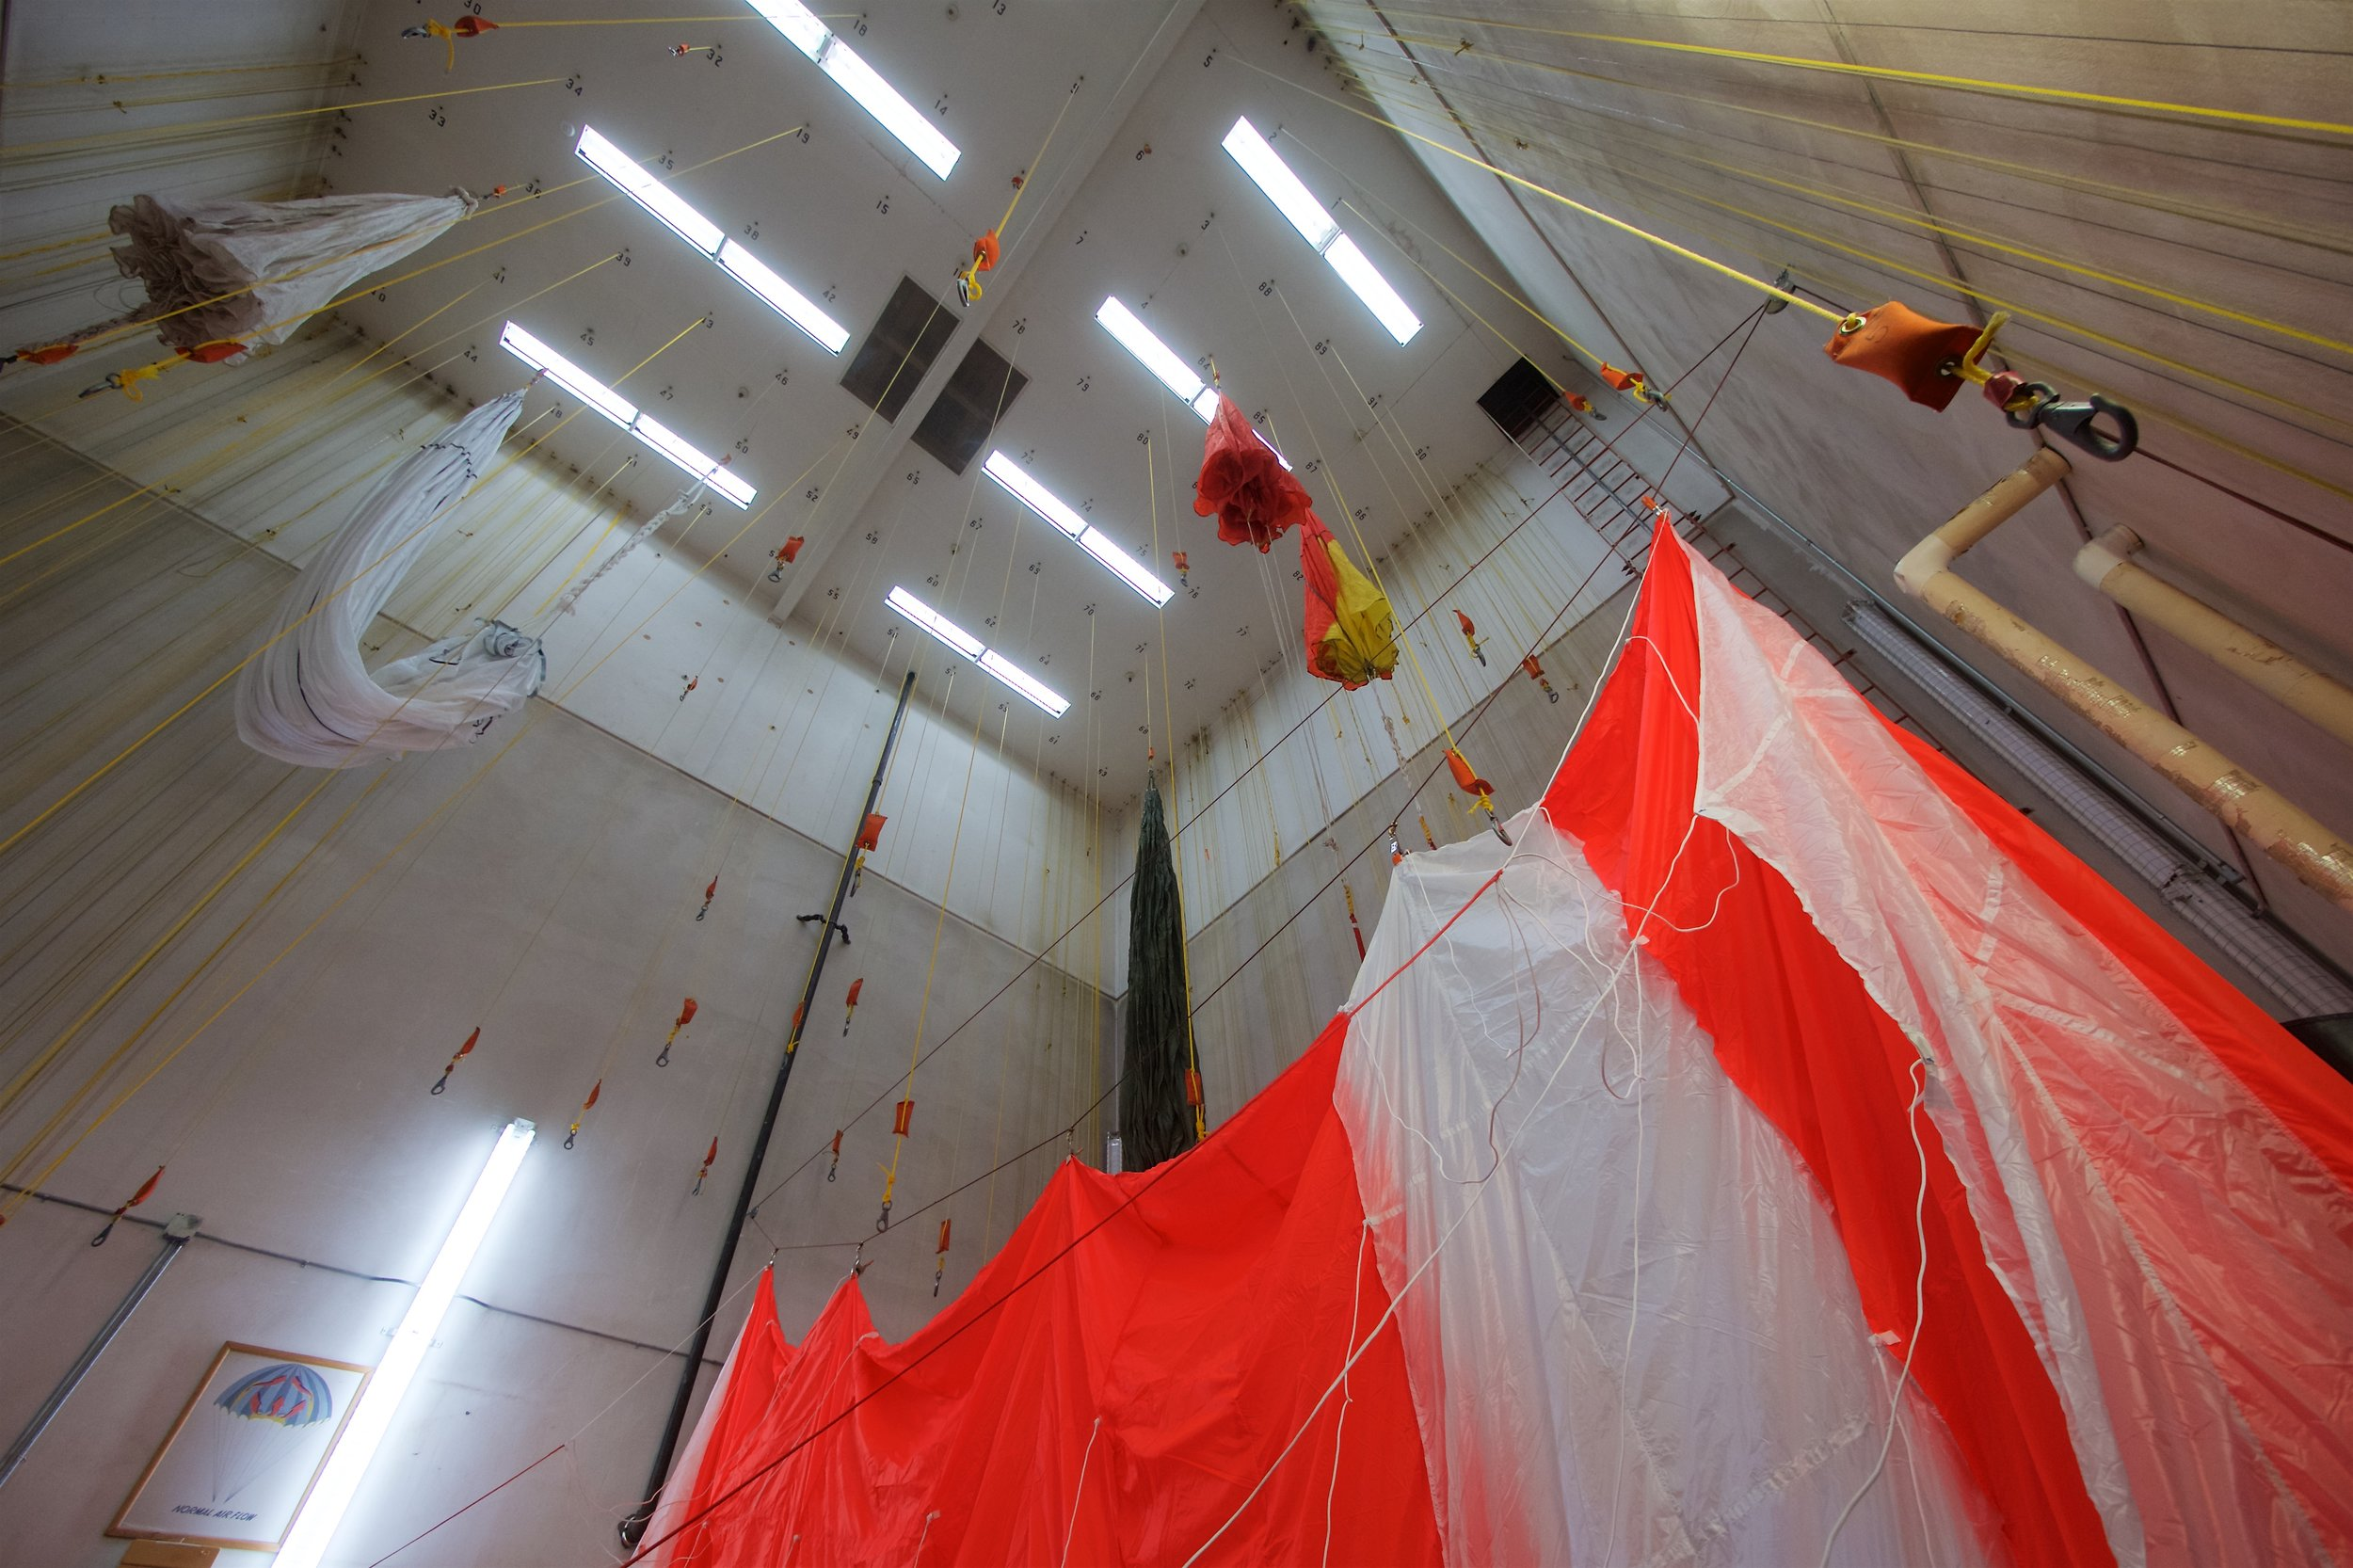 Parachute drying tower